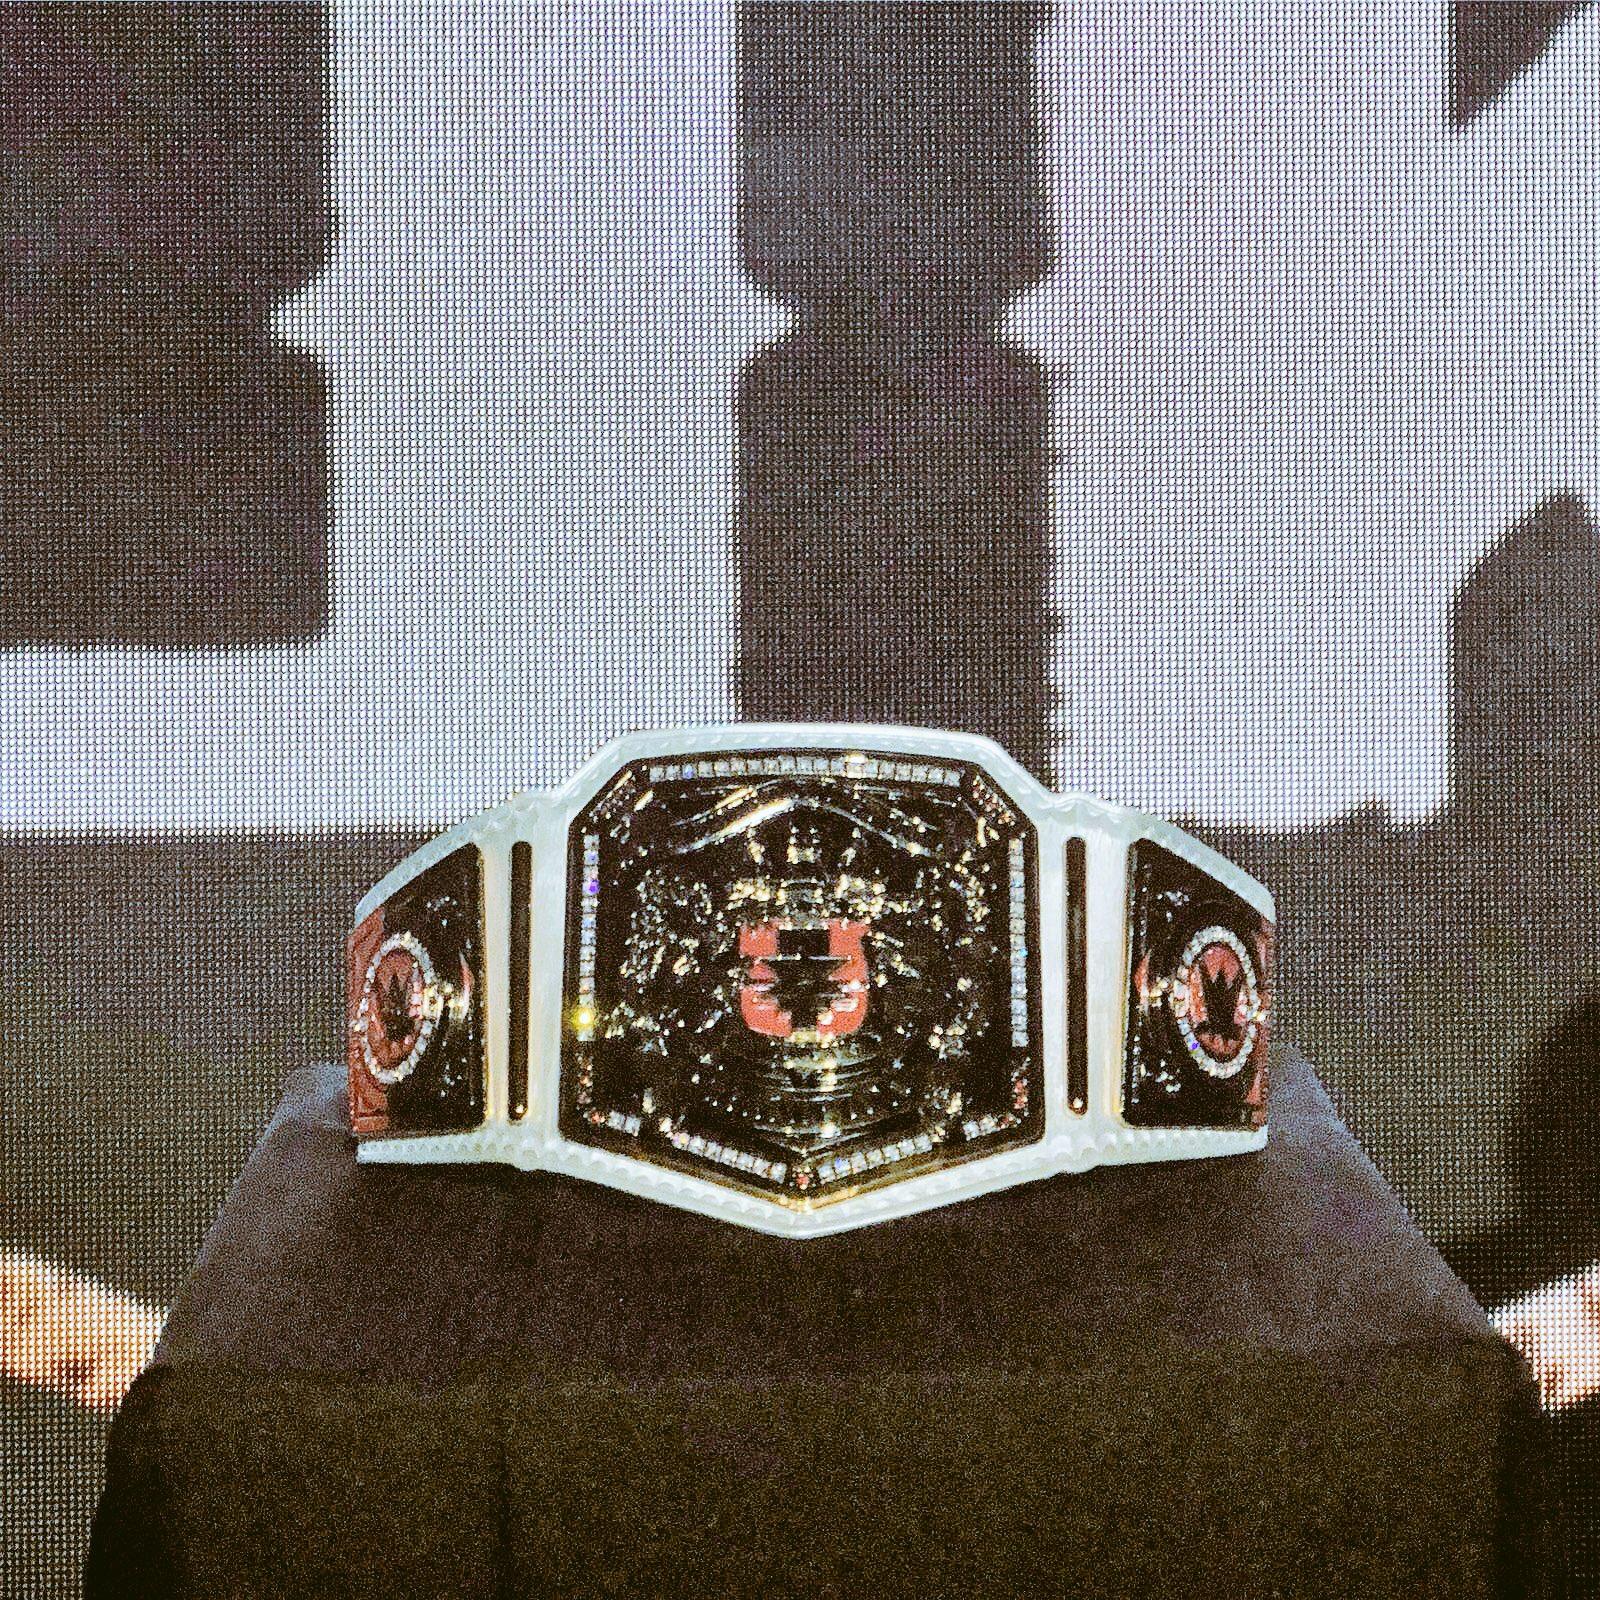 NXT UK : La première championne féminine sera couronnée ce week-end Dld1CjPWwAA3PZm?format=jpg&name=large